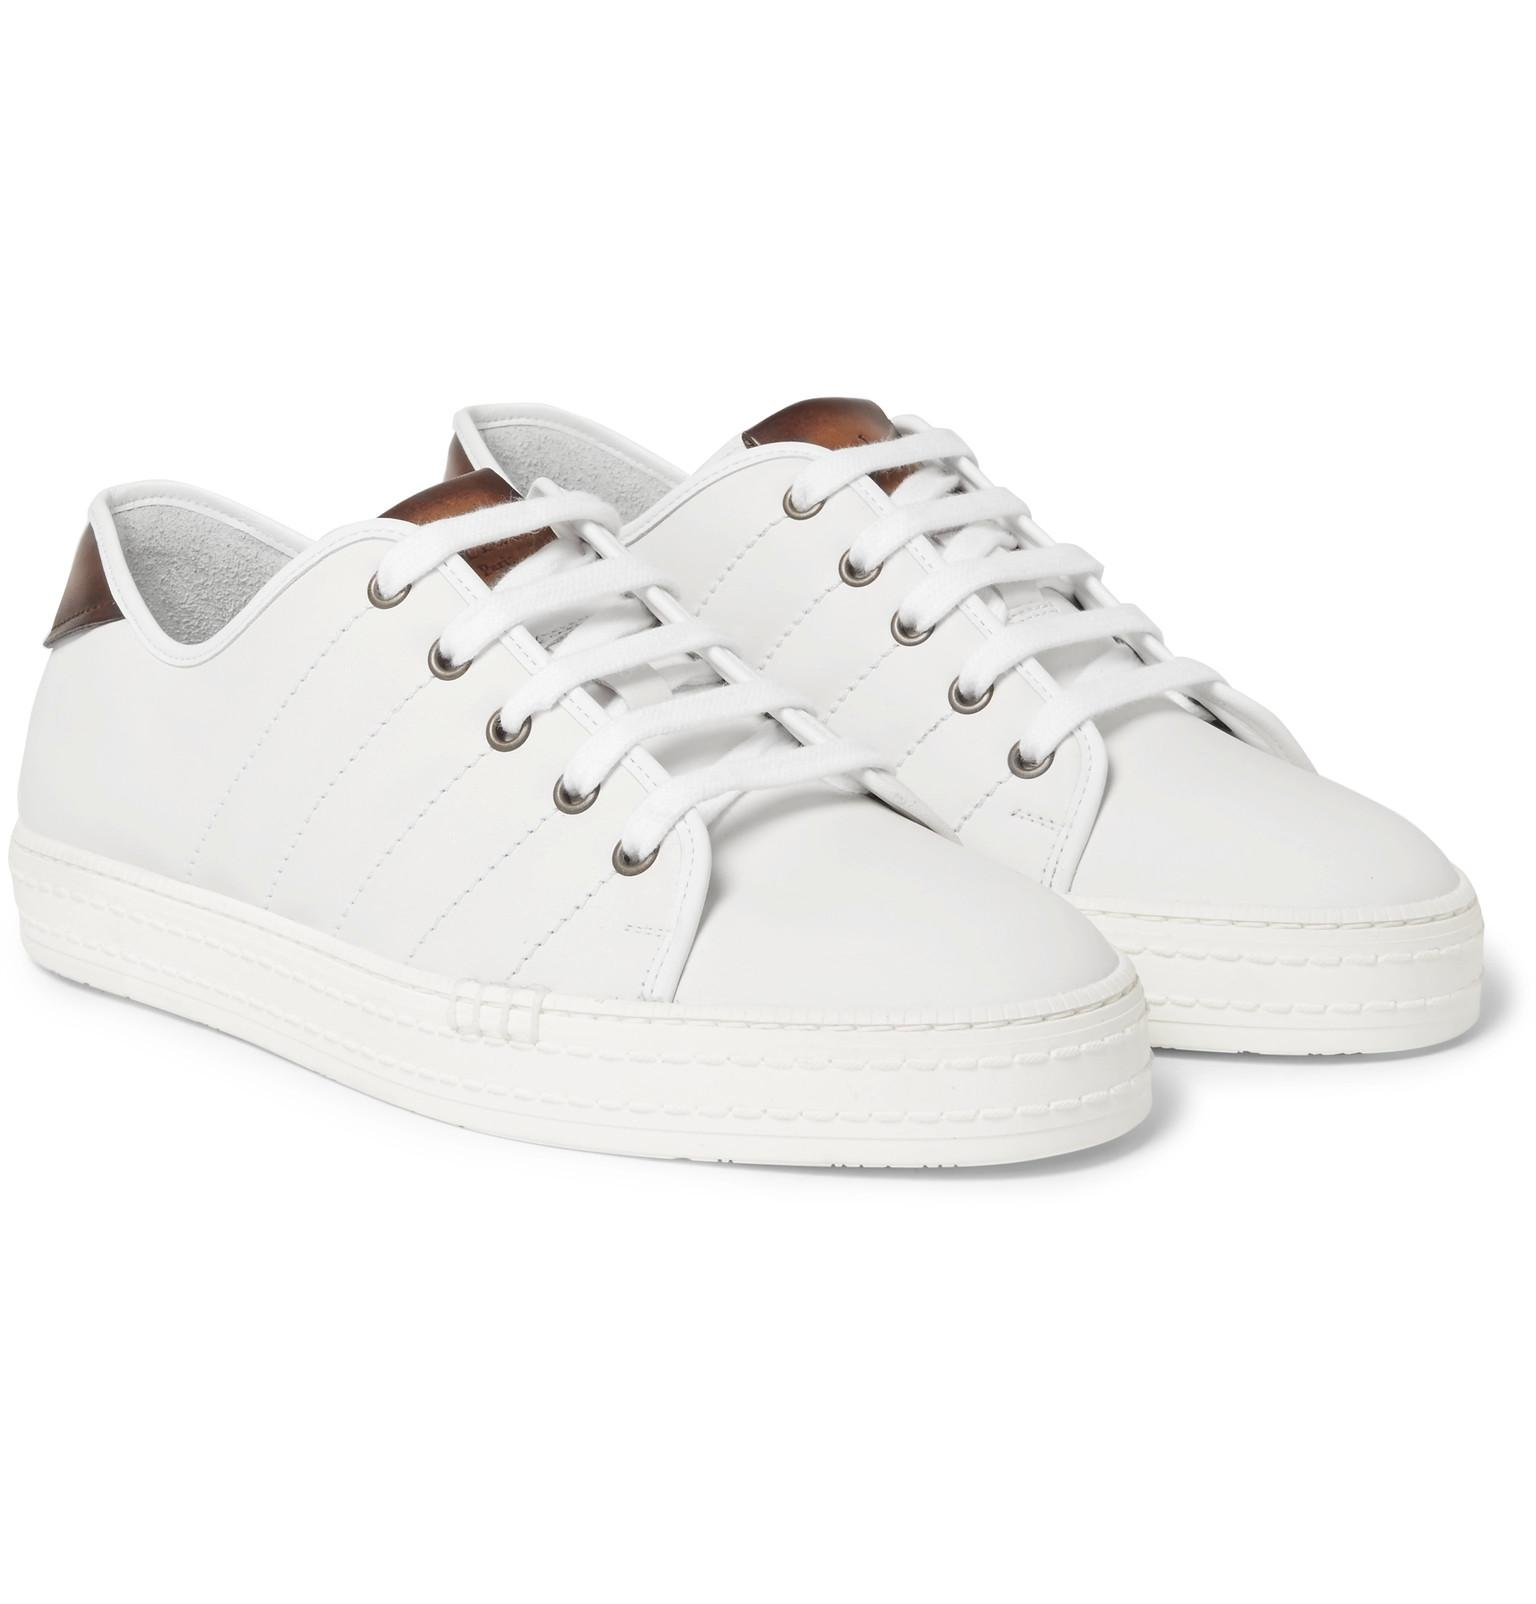 Berluti Playfield Leather Sneakers in